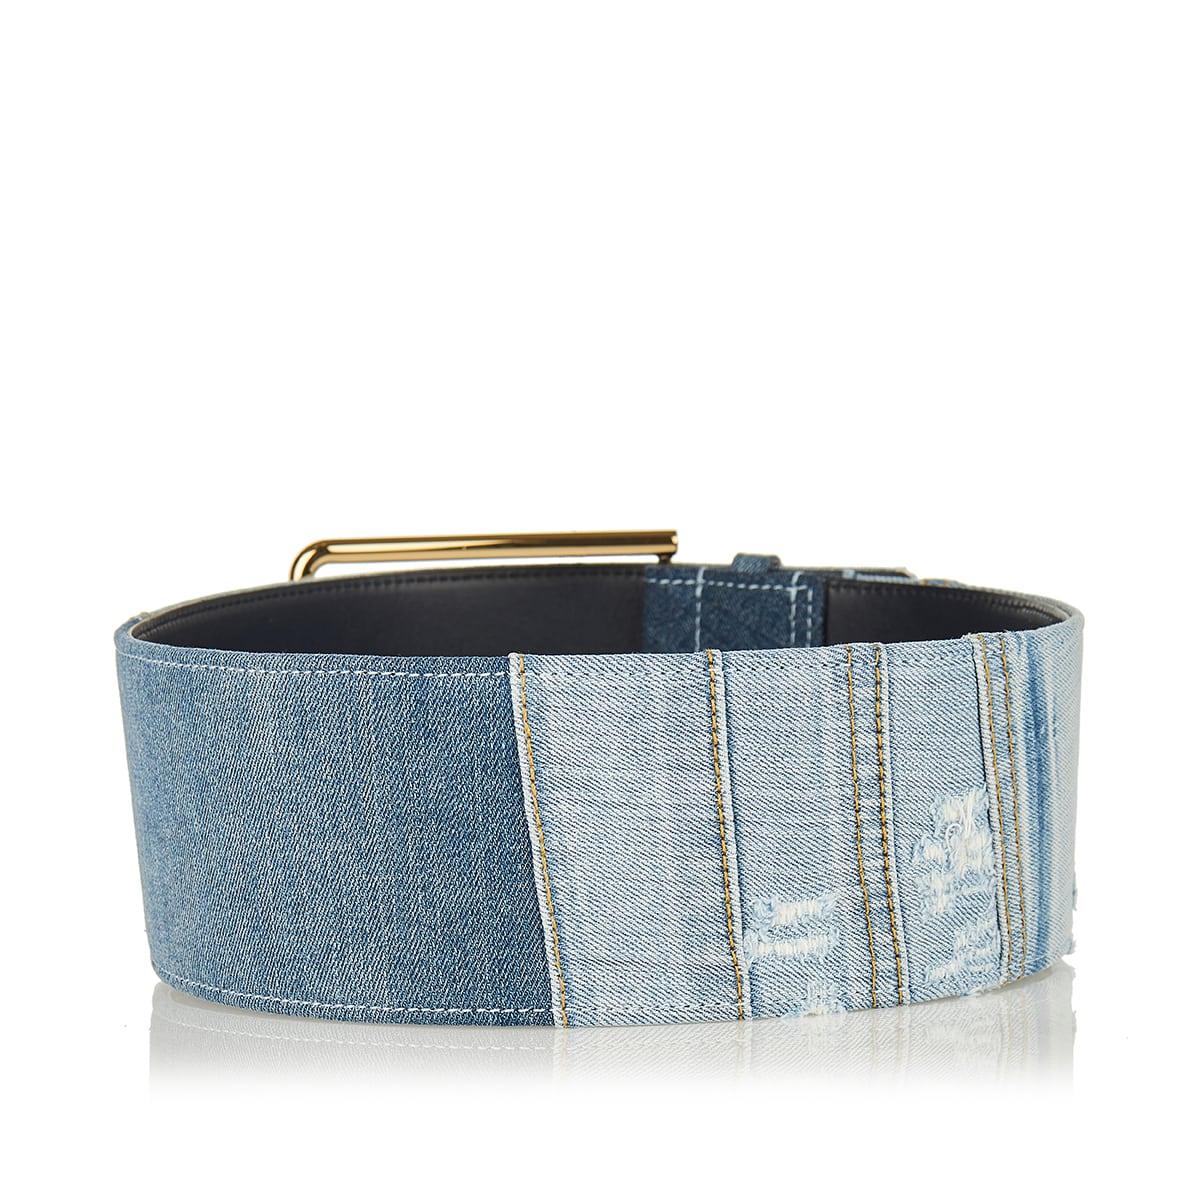 Patchwork denim wide belt